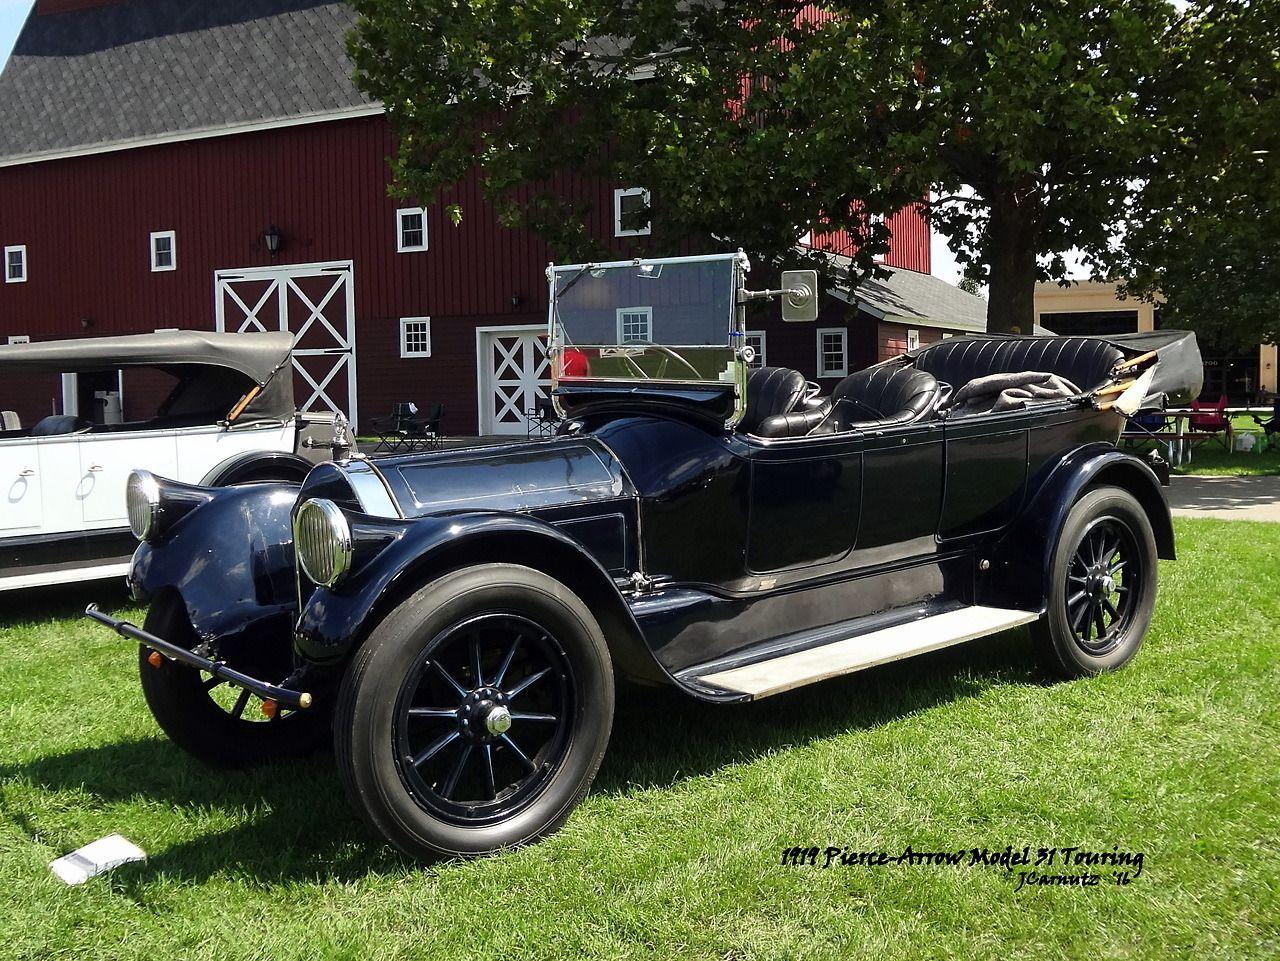 1919 Pierce-Arrow Model 31 Touring 2016 Pierce-Arrow Society\'s Mini ...